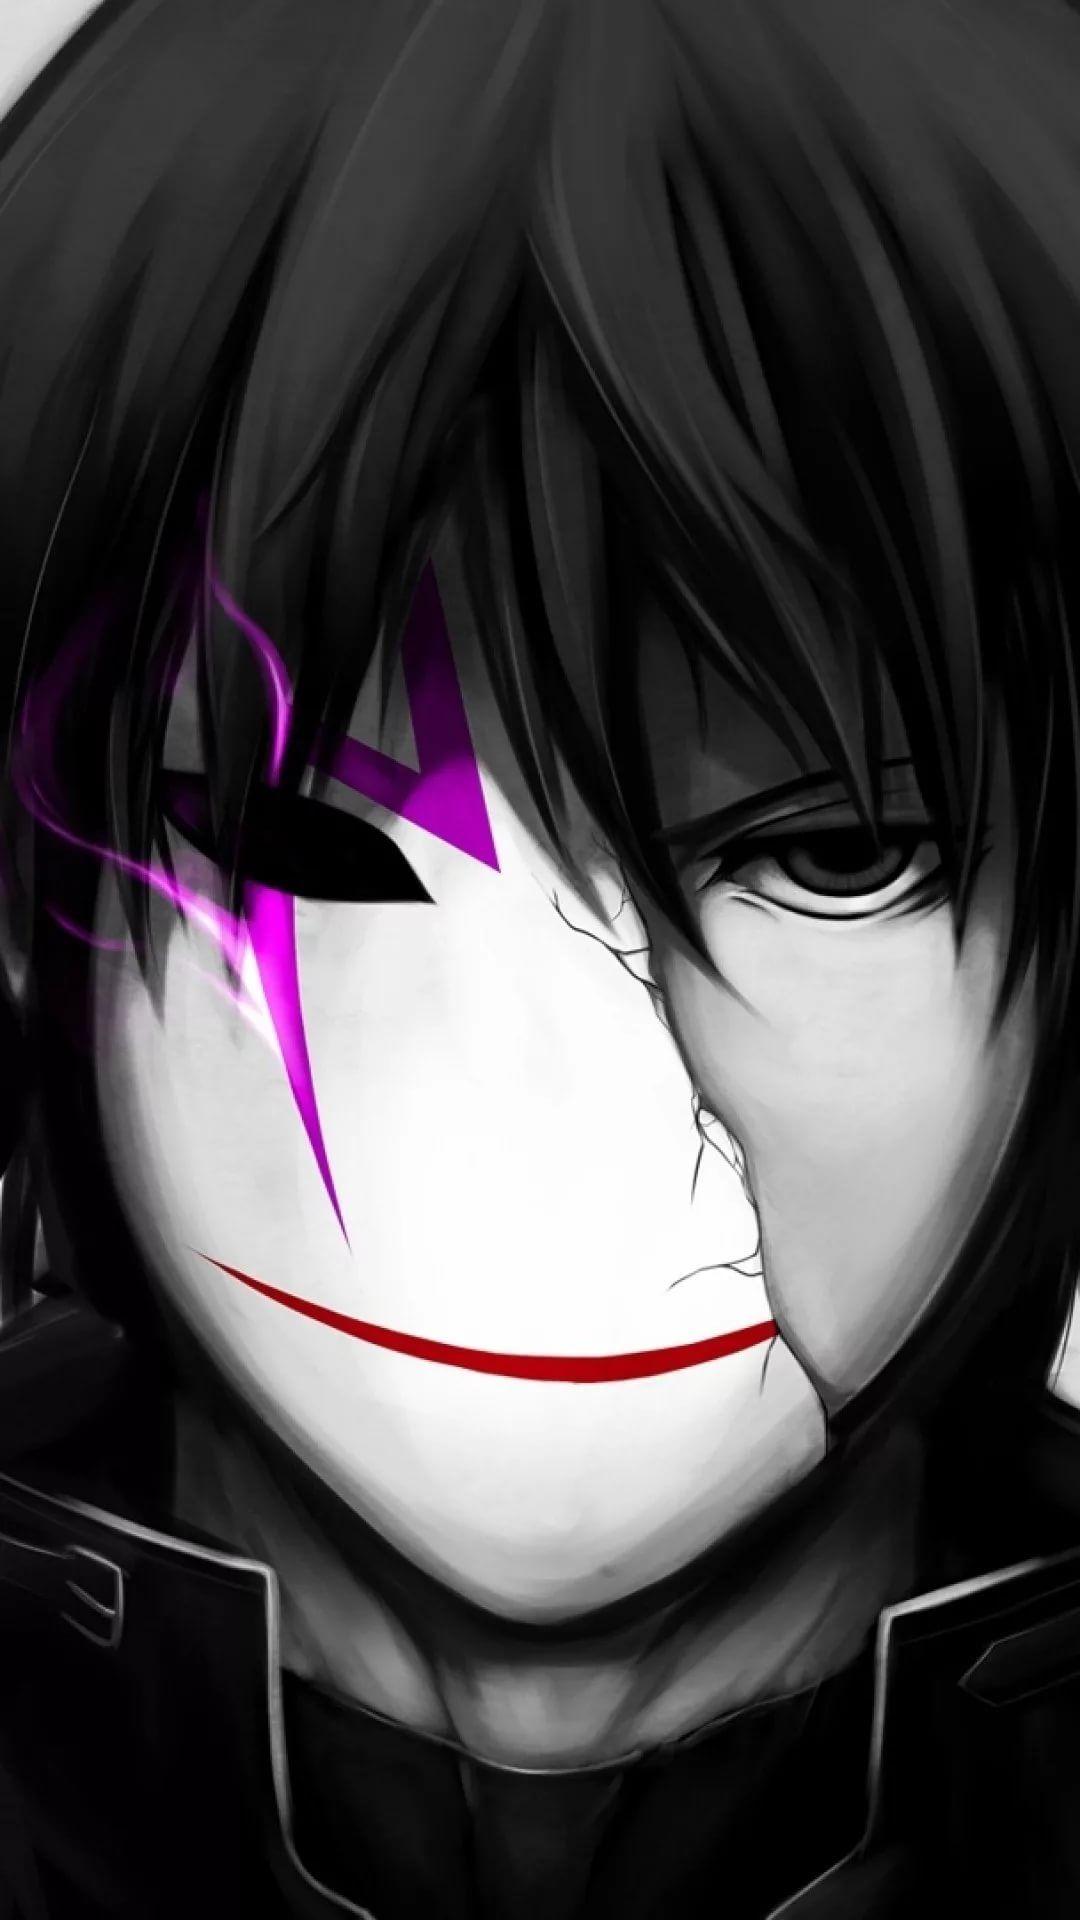 Sad Anime wallpaper 1080x1920